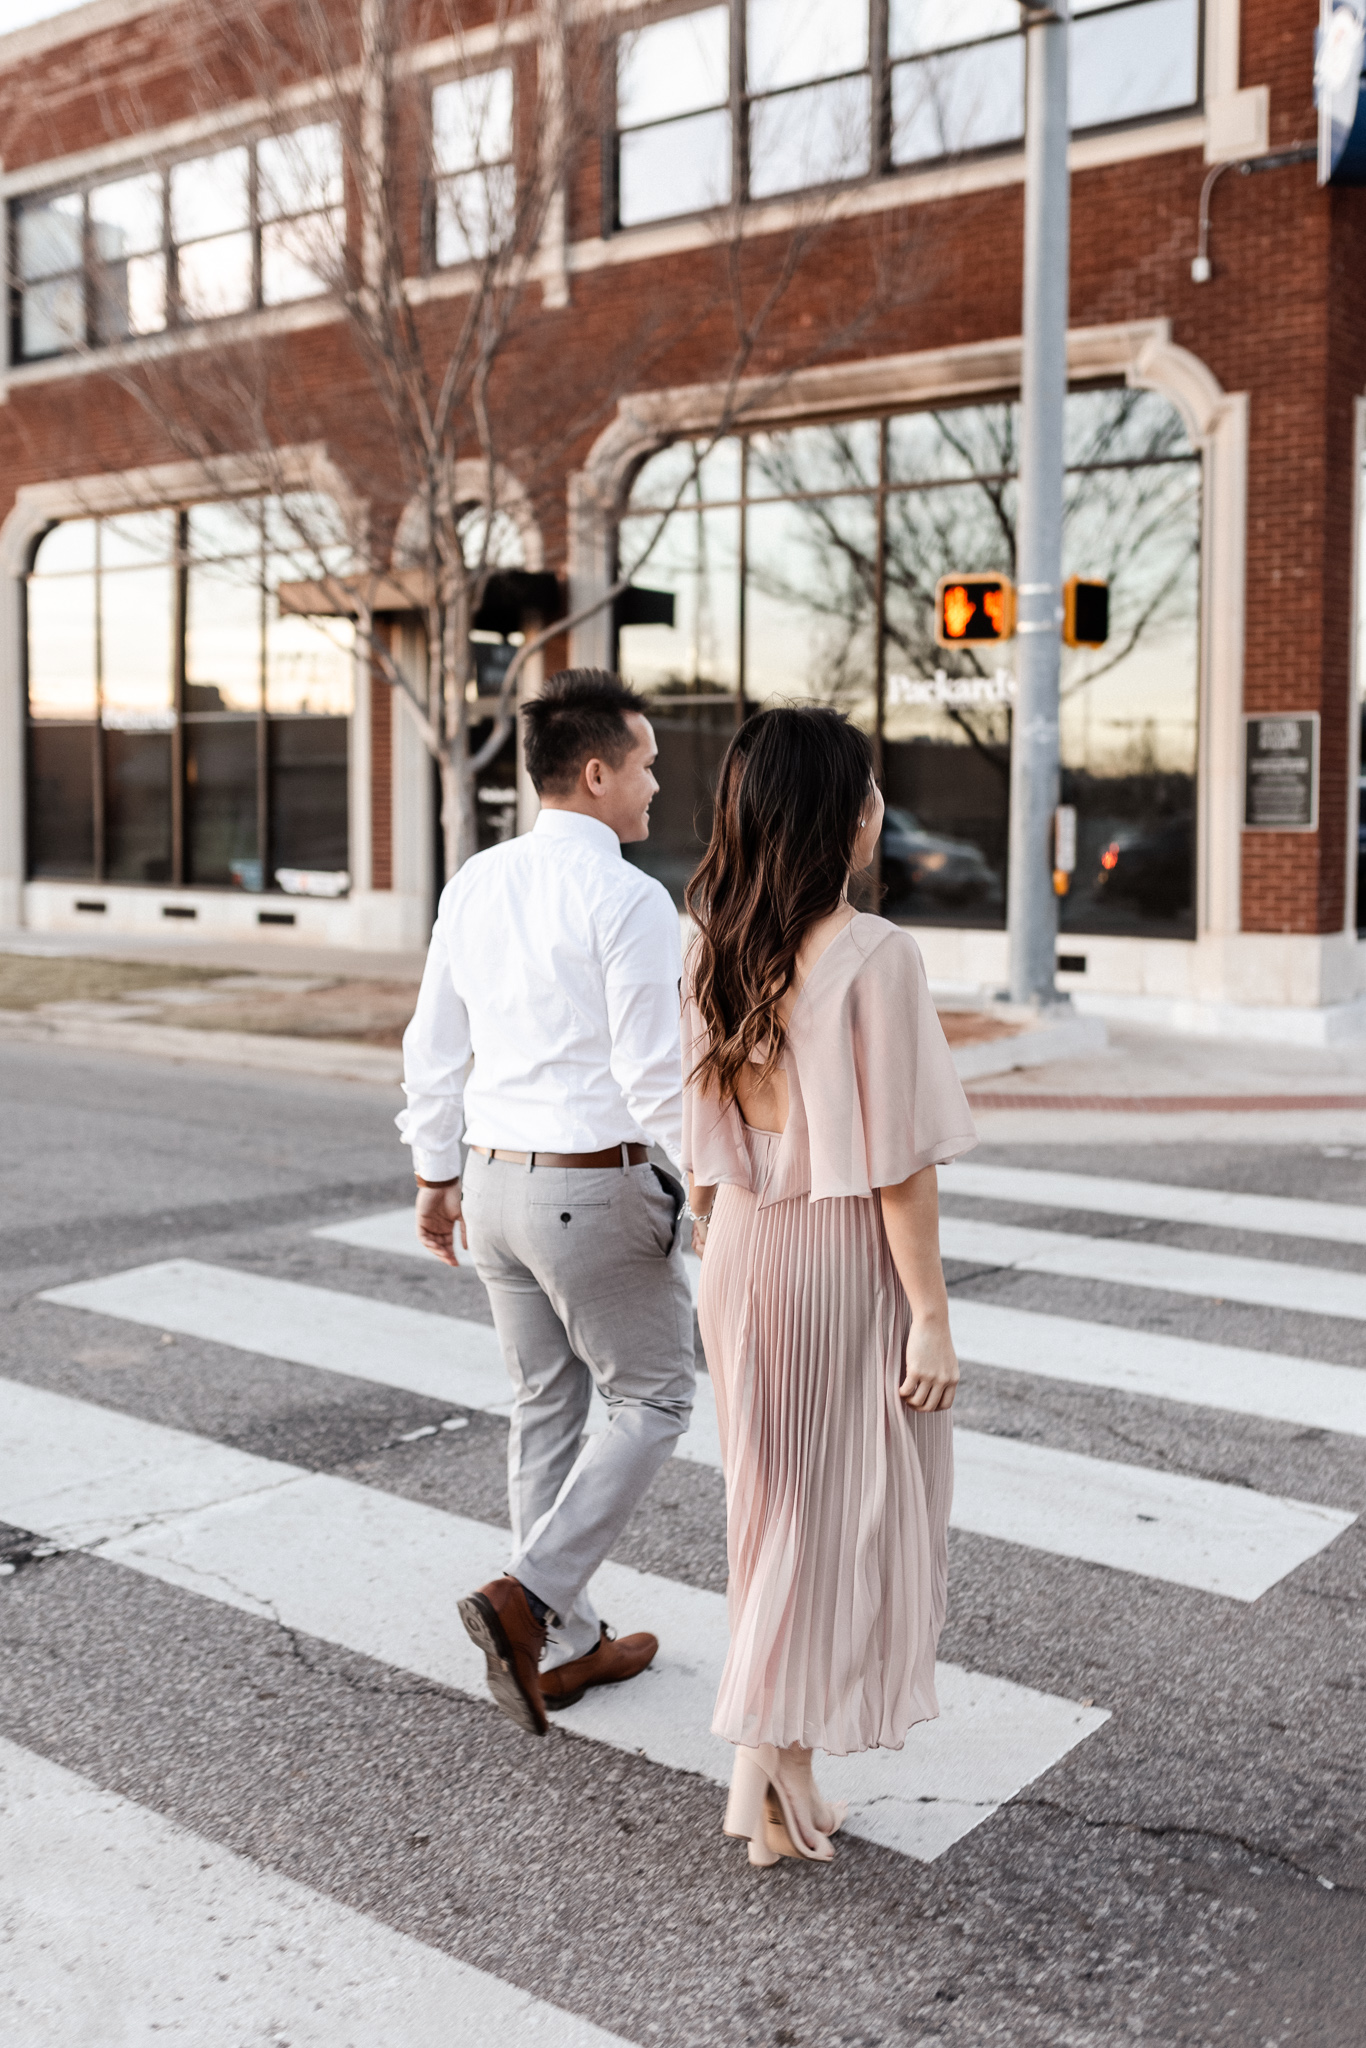 Hieu + Teresa | Colorful Romantic Downtown Engagements | Oklahoma Wedding Photographer-55.jpg